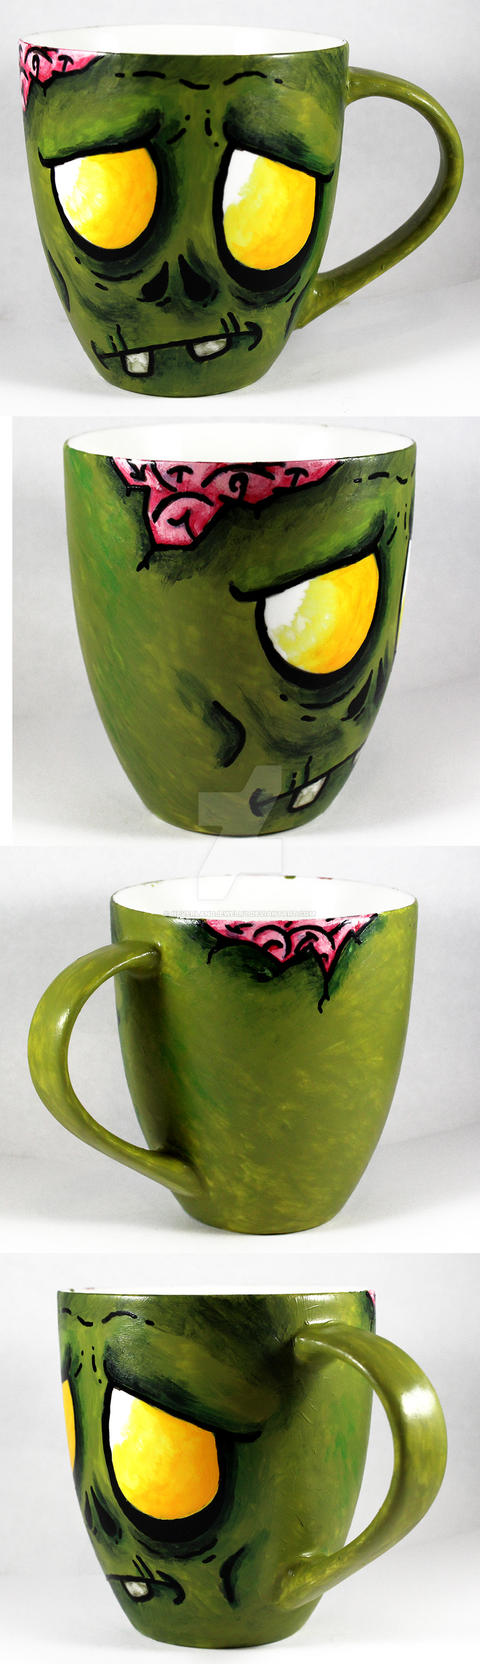 Handpainted Zombie Cup by NeverlandJewelry